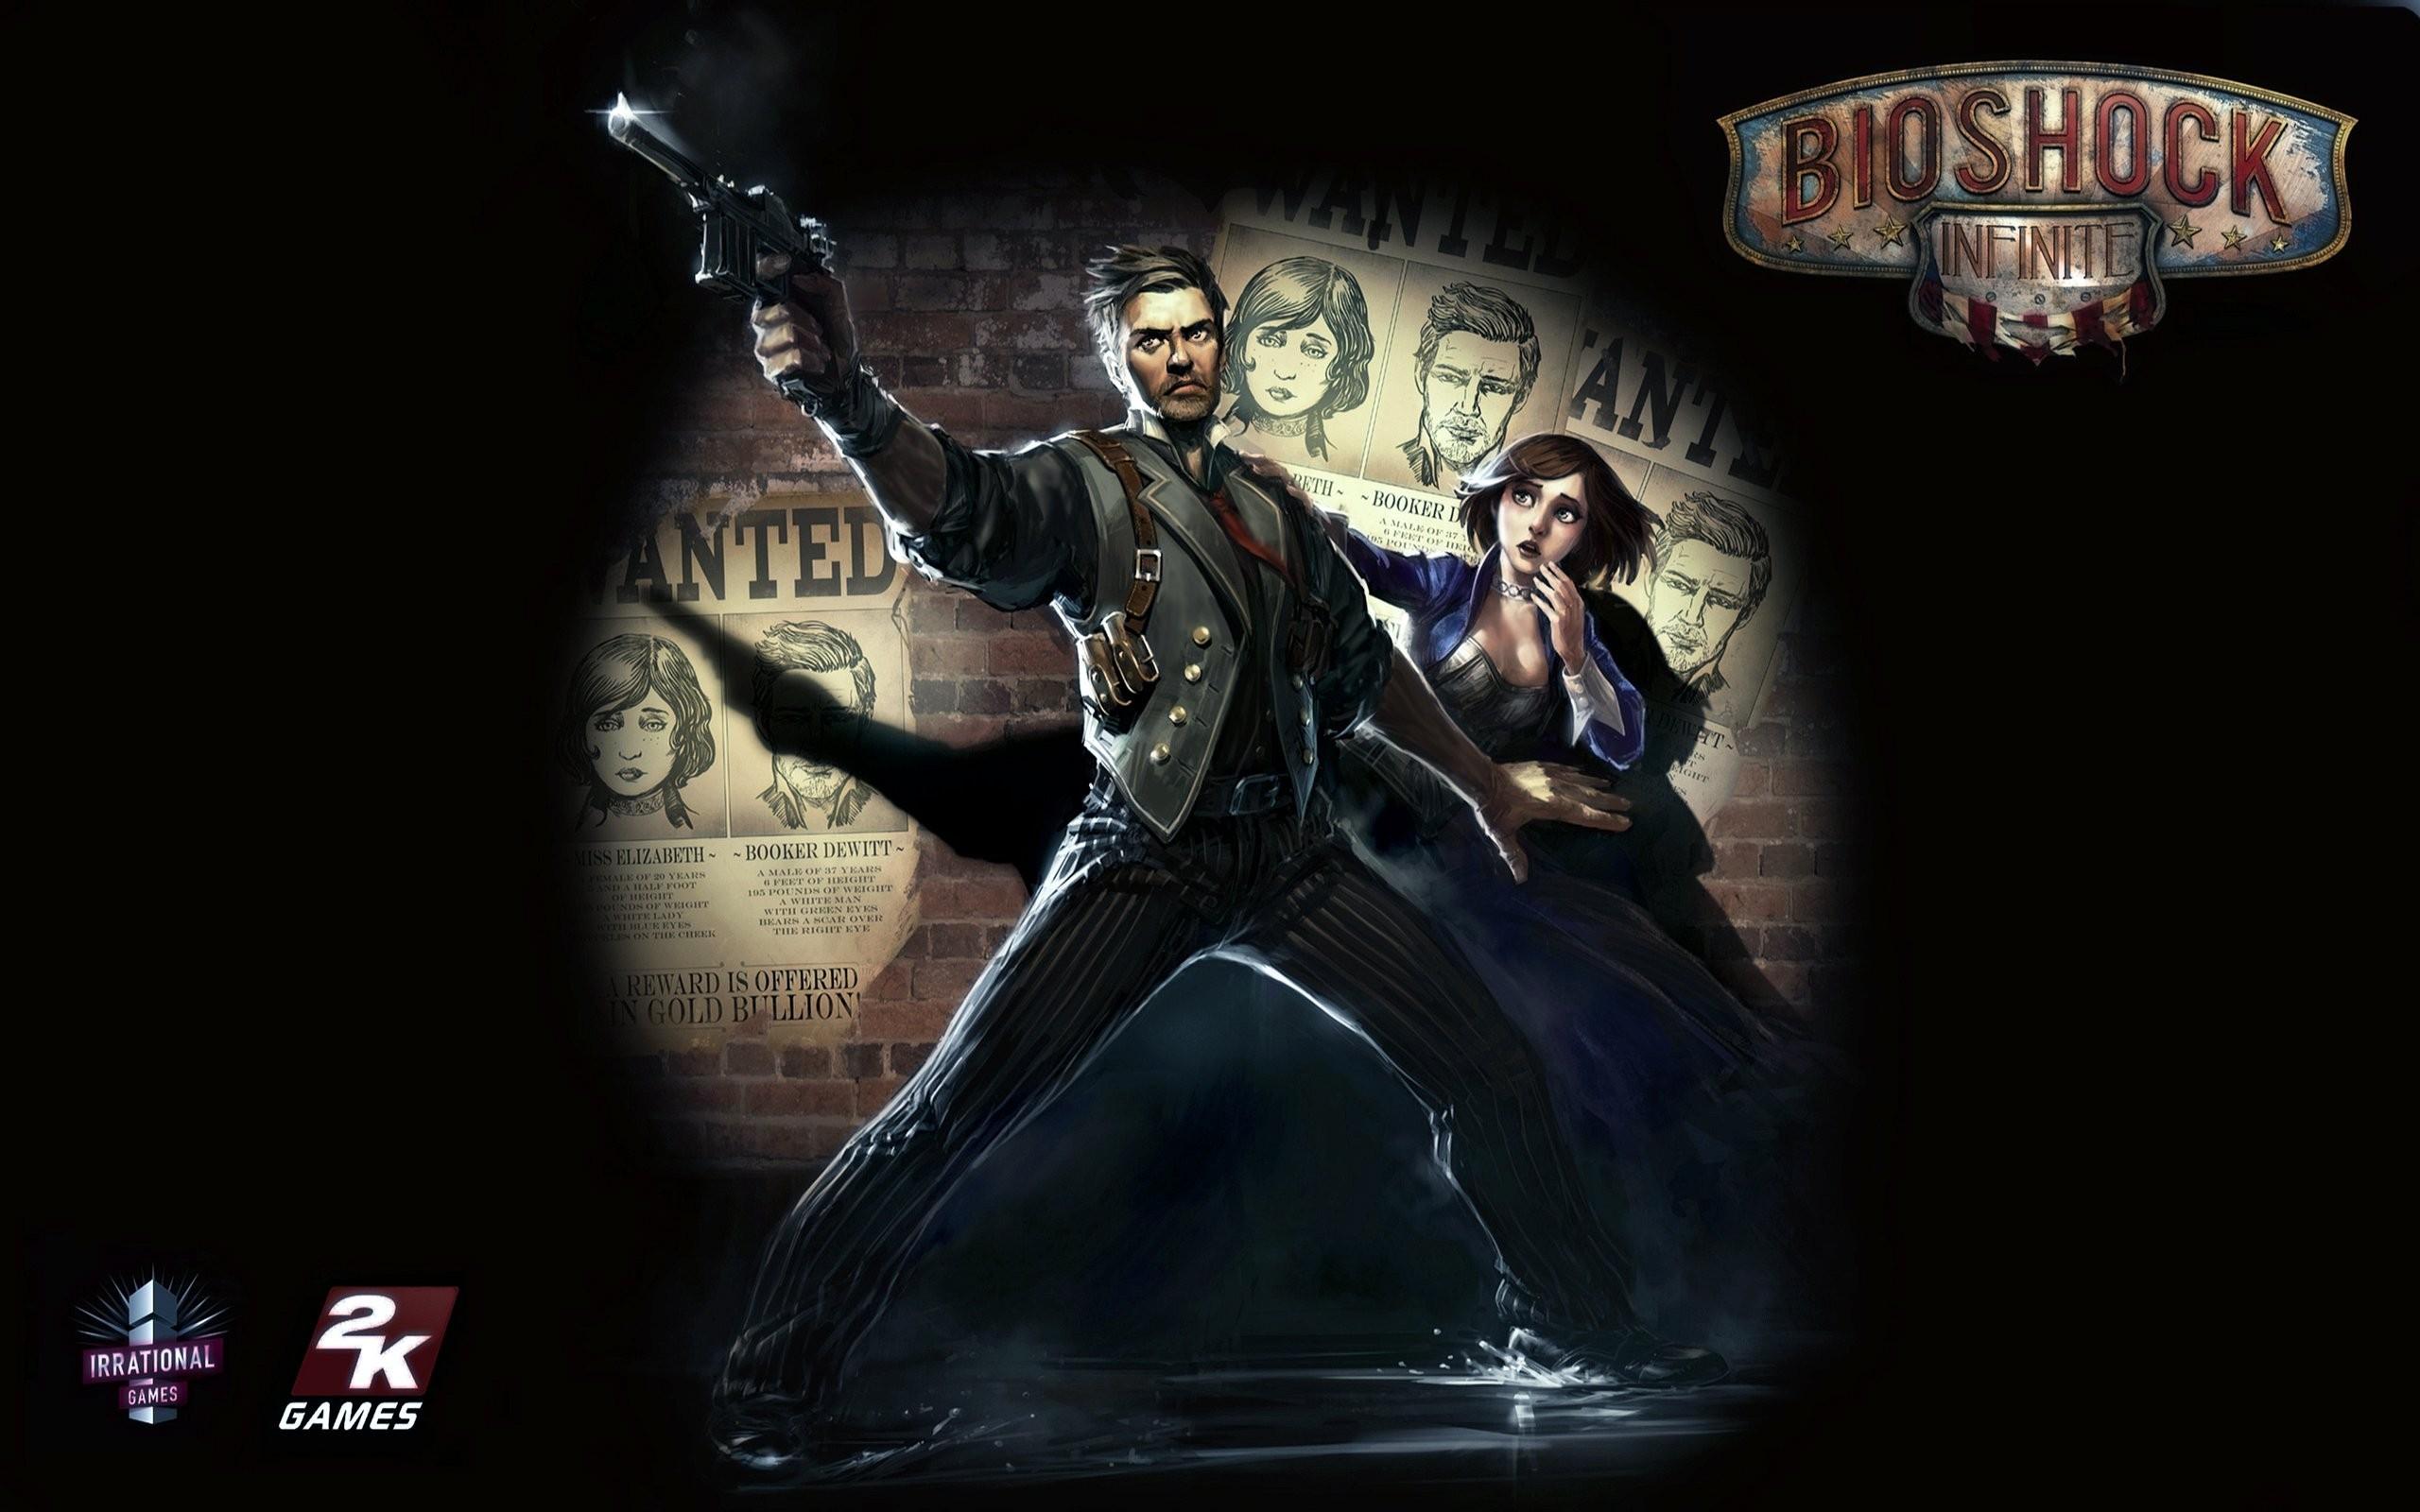 Video Game – Bioshock Infinite Wallpaper